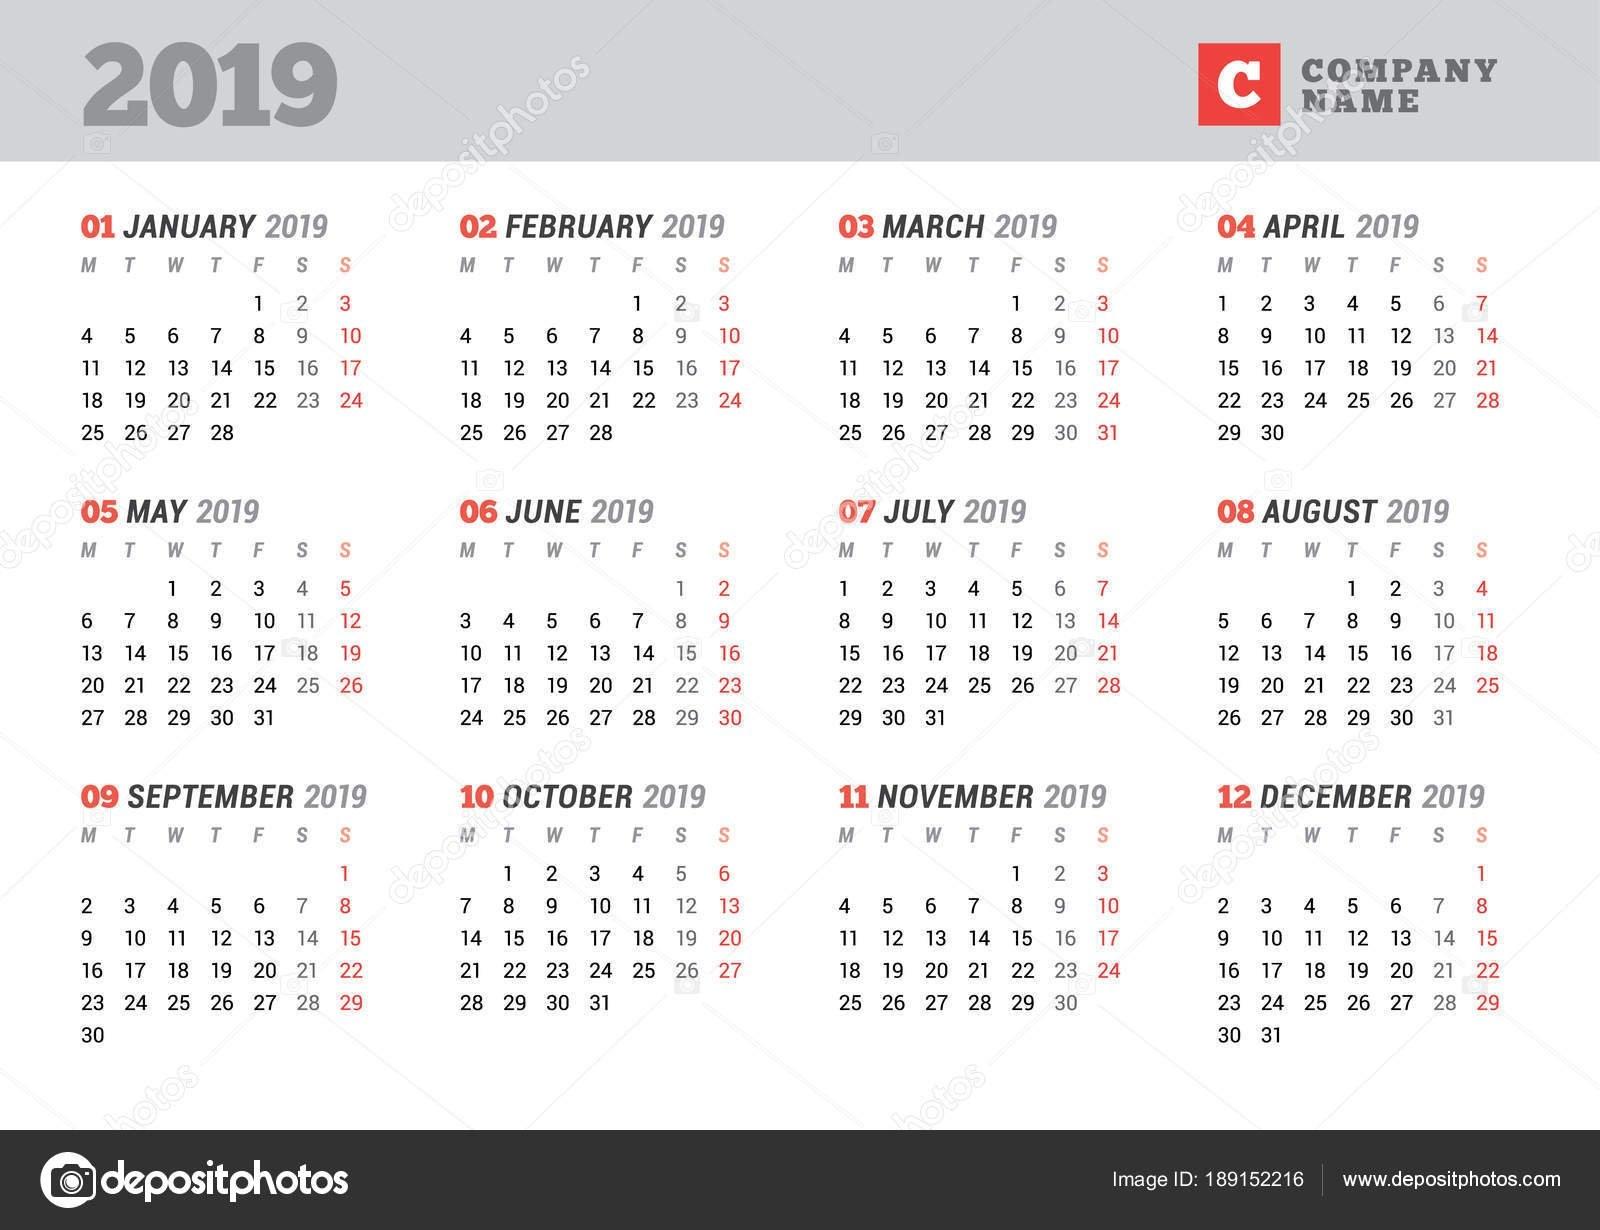 Calendar Template For 2019 Year. Stationery Design. Week Starts On Calendar Week 12 2019